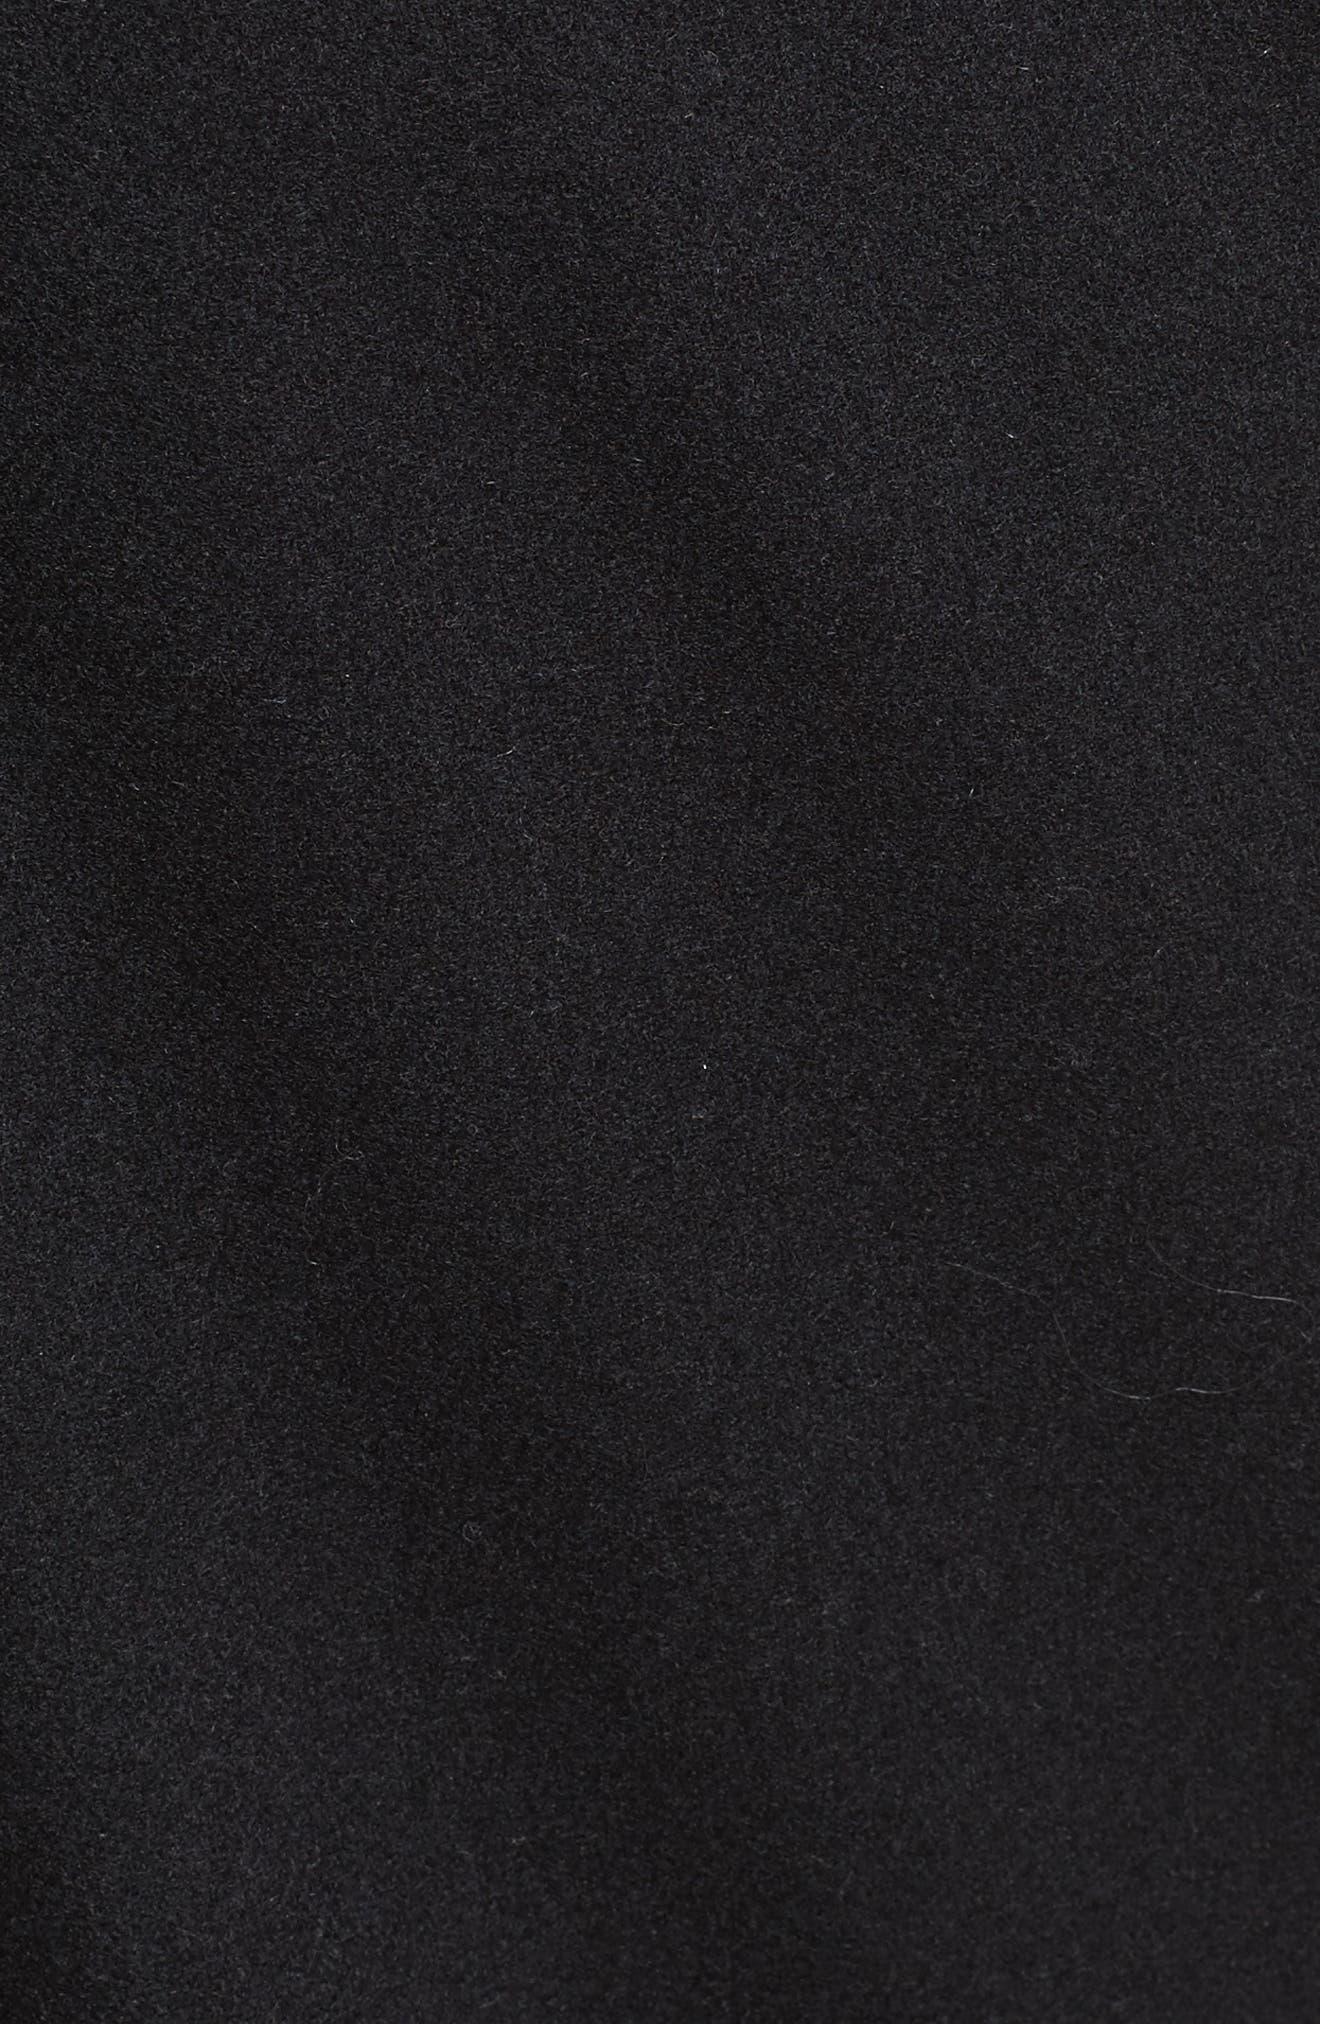 Cropped Wool Blend Pants,                             Alternate thumbnail 5, color,                             Black